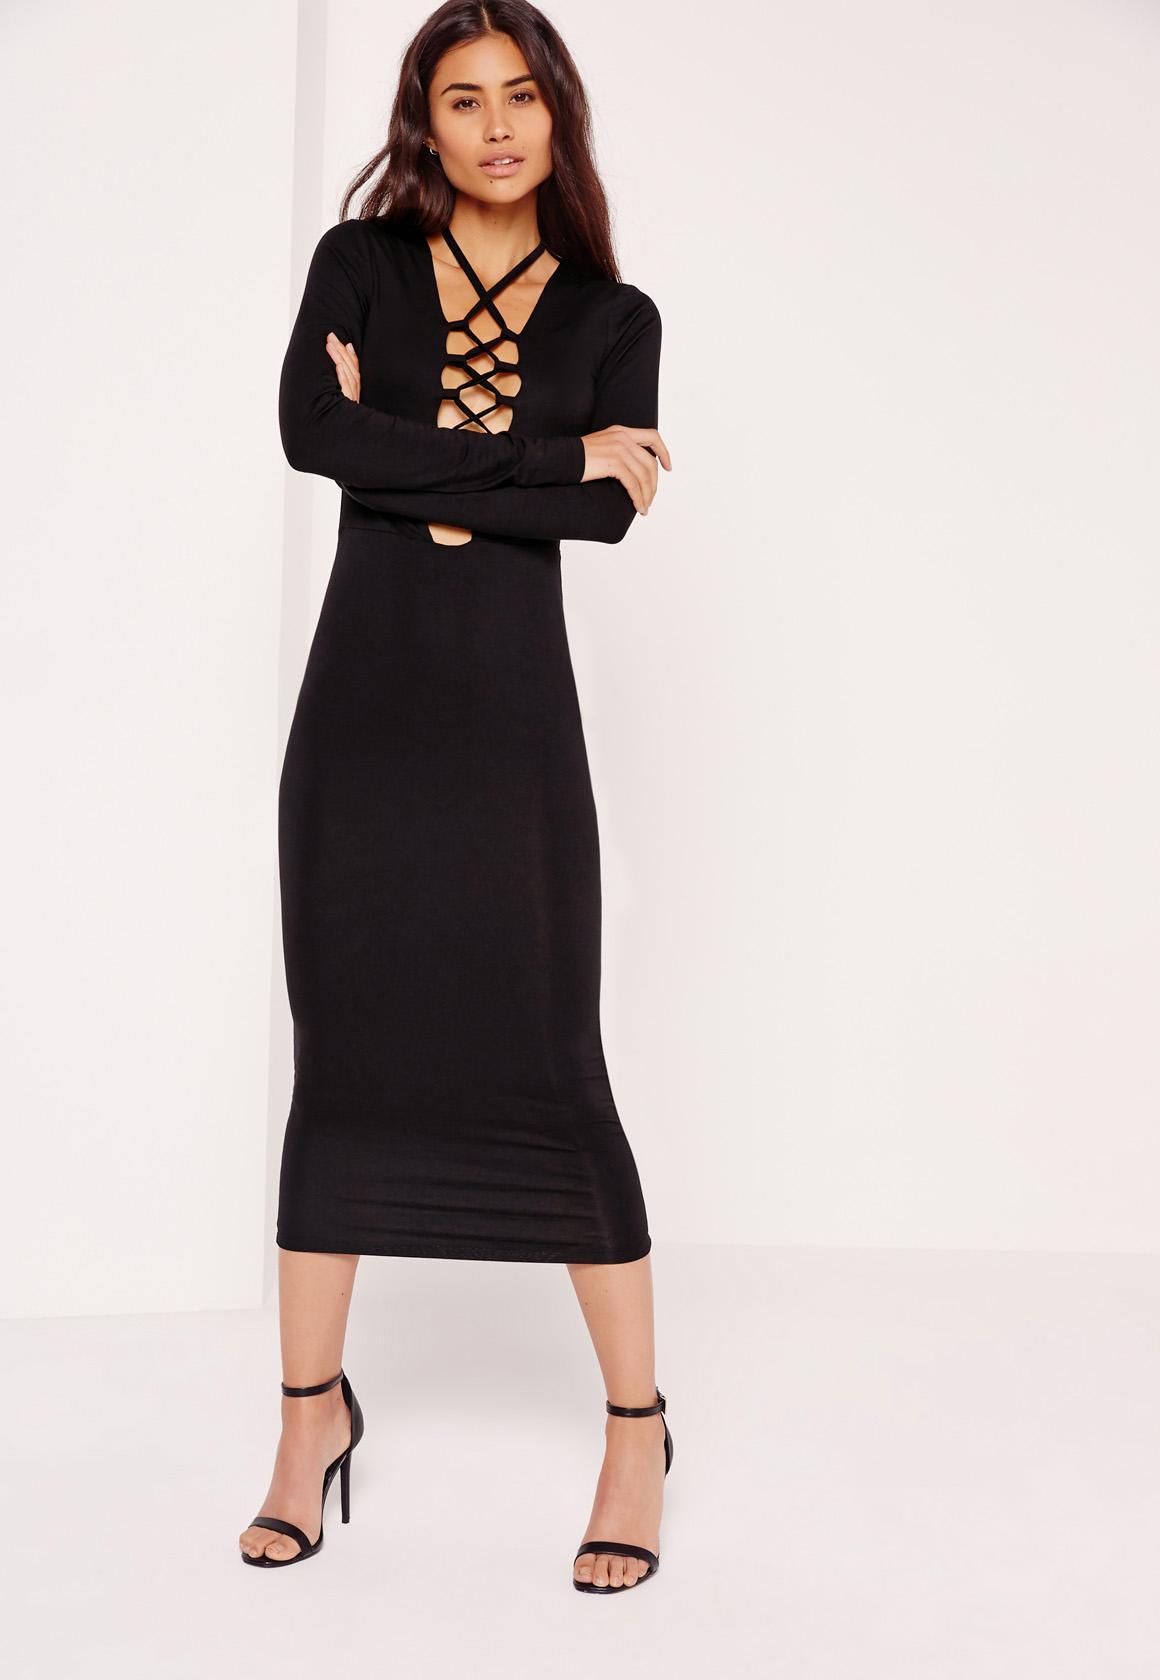 Lace Up Front Midi Dress Black